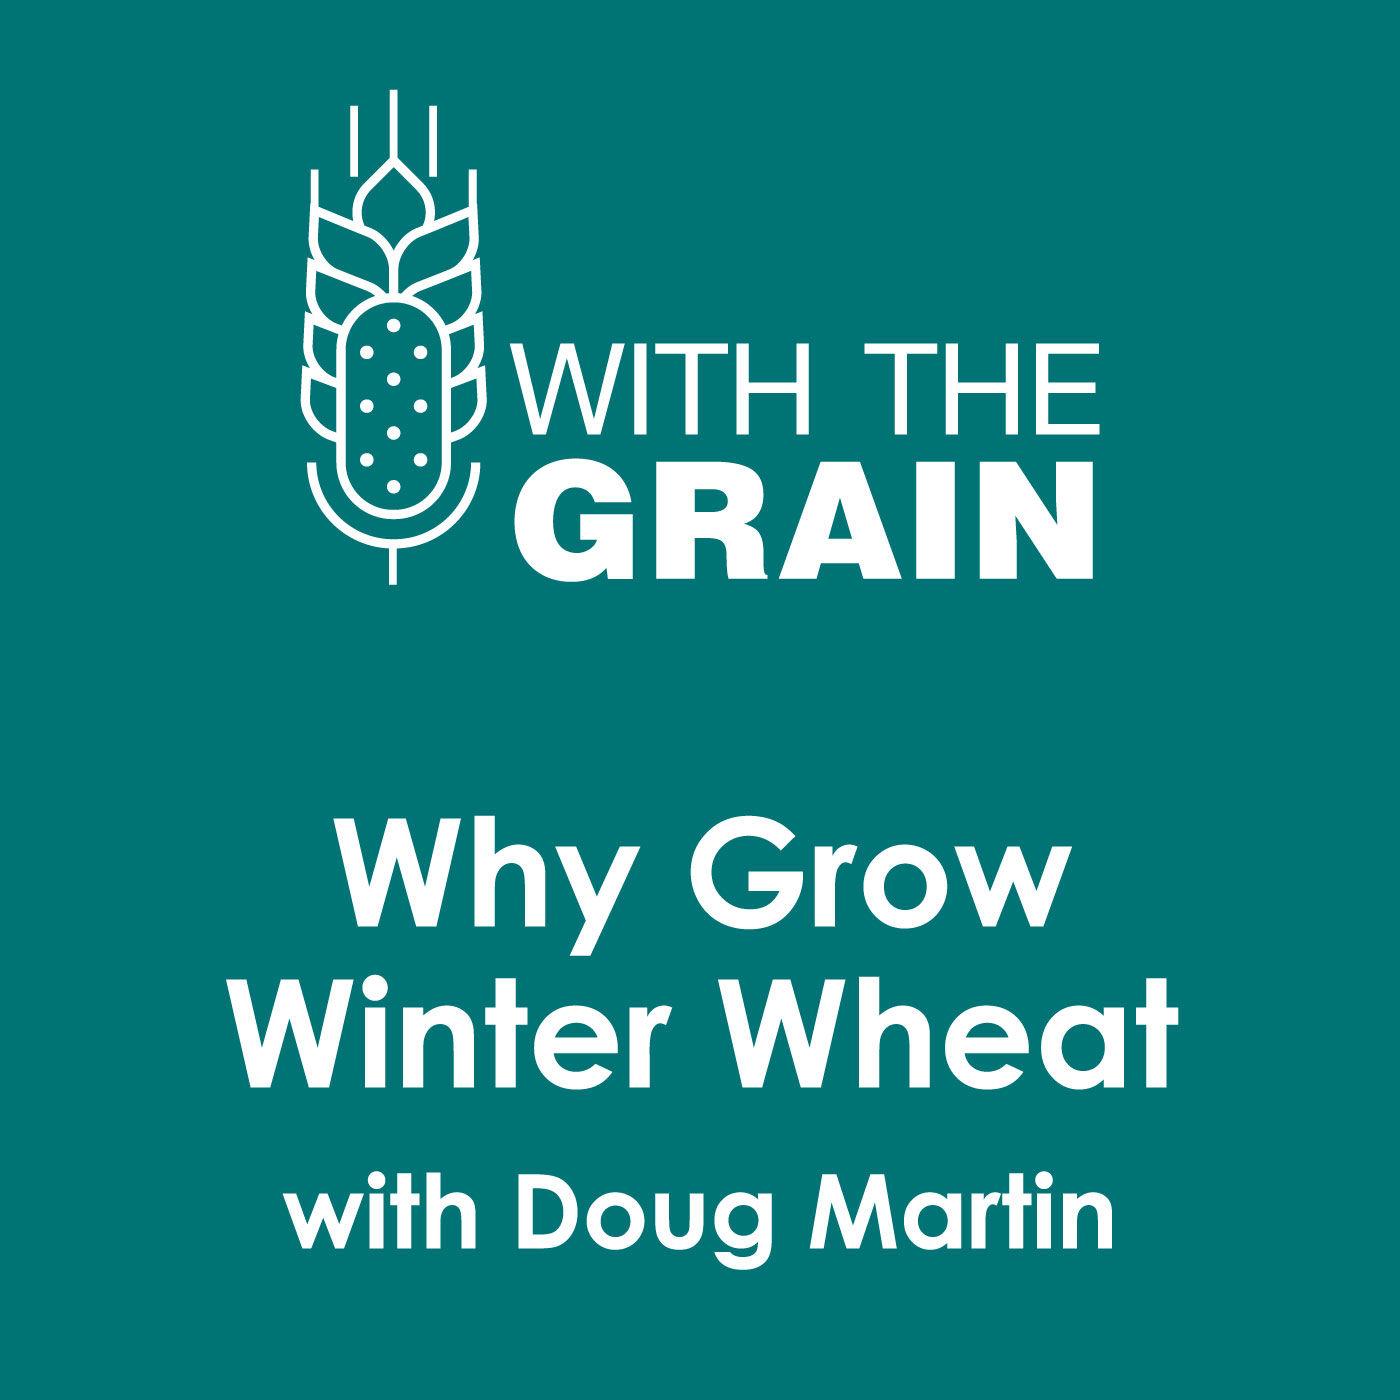 Why Grow Winter Wheat? with Doug Martin